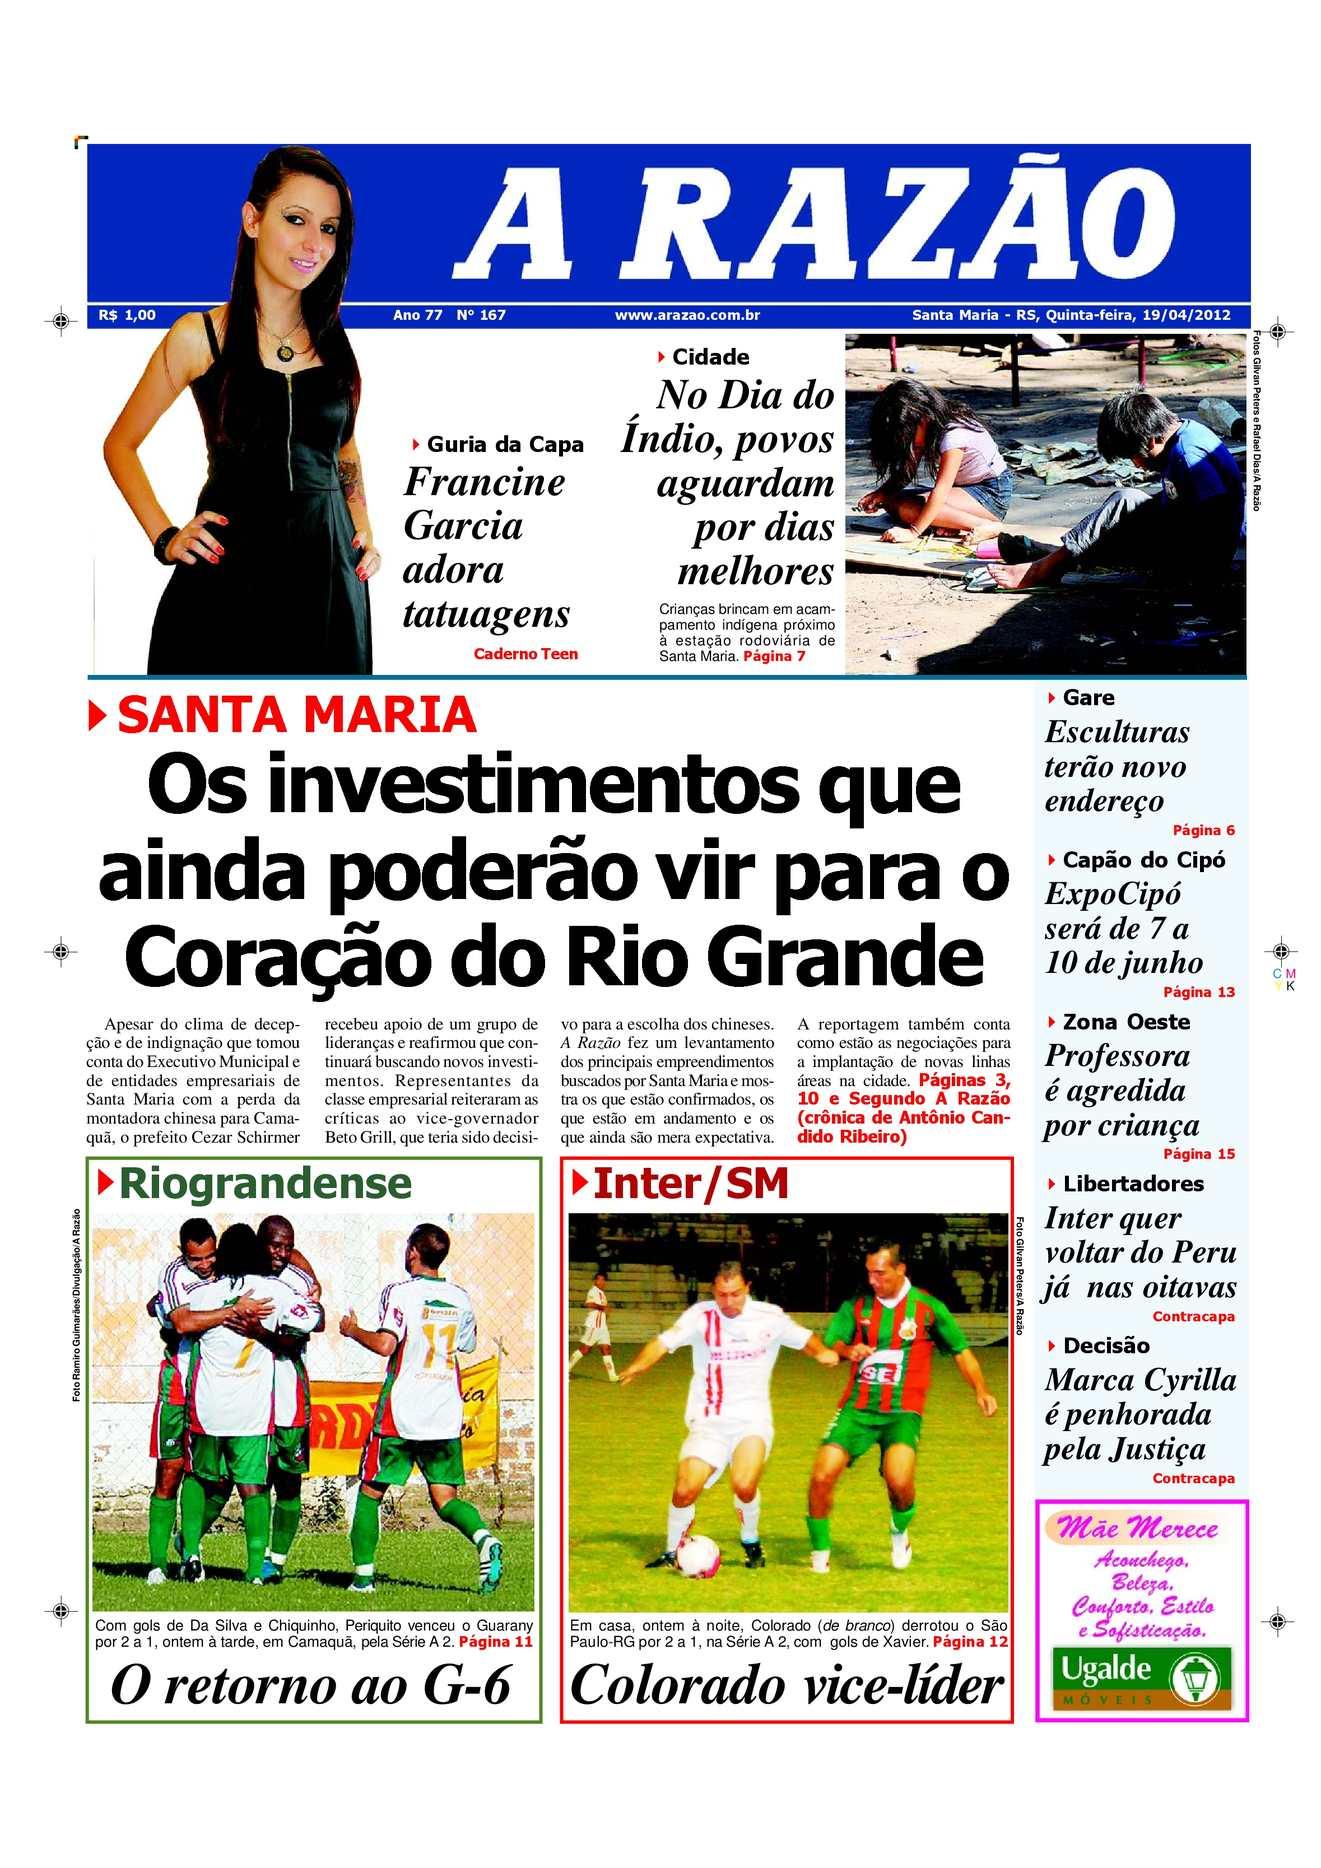 Calaméo - Jornal A Razão Santa Maria - 19042012 61d058713cafb